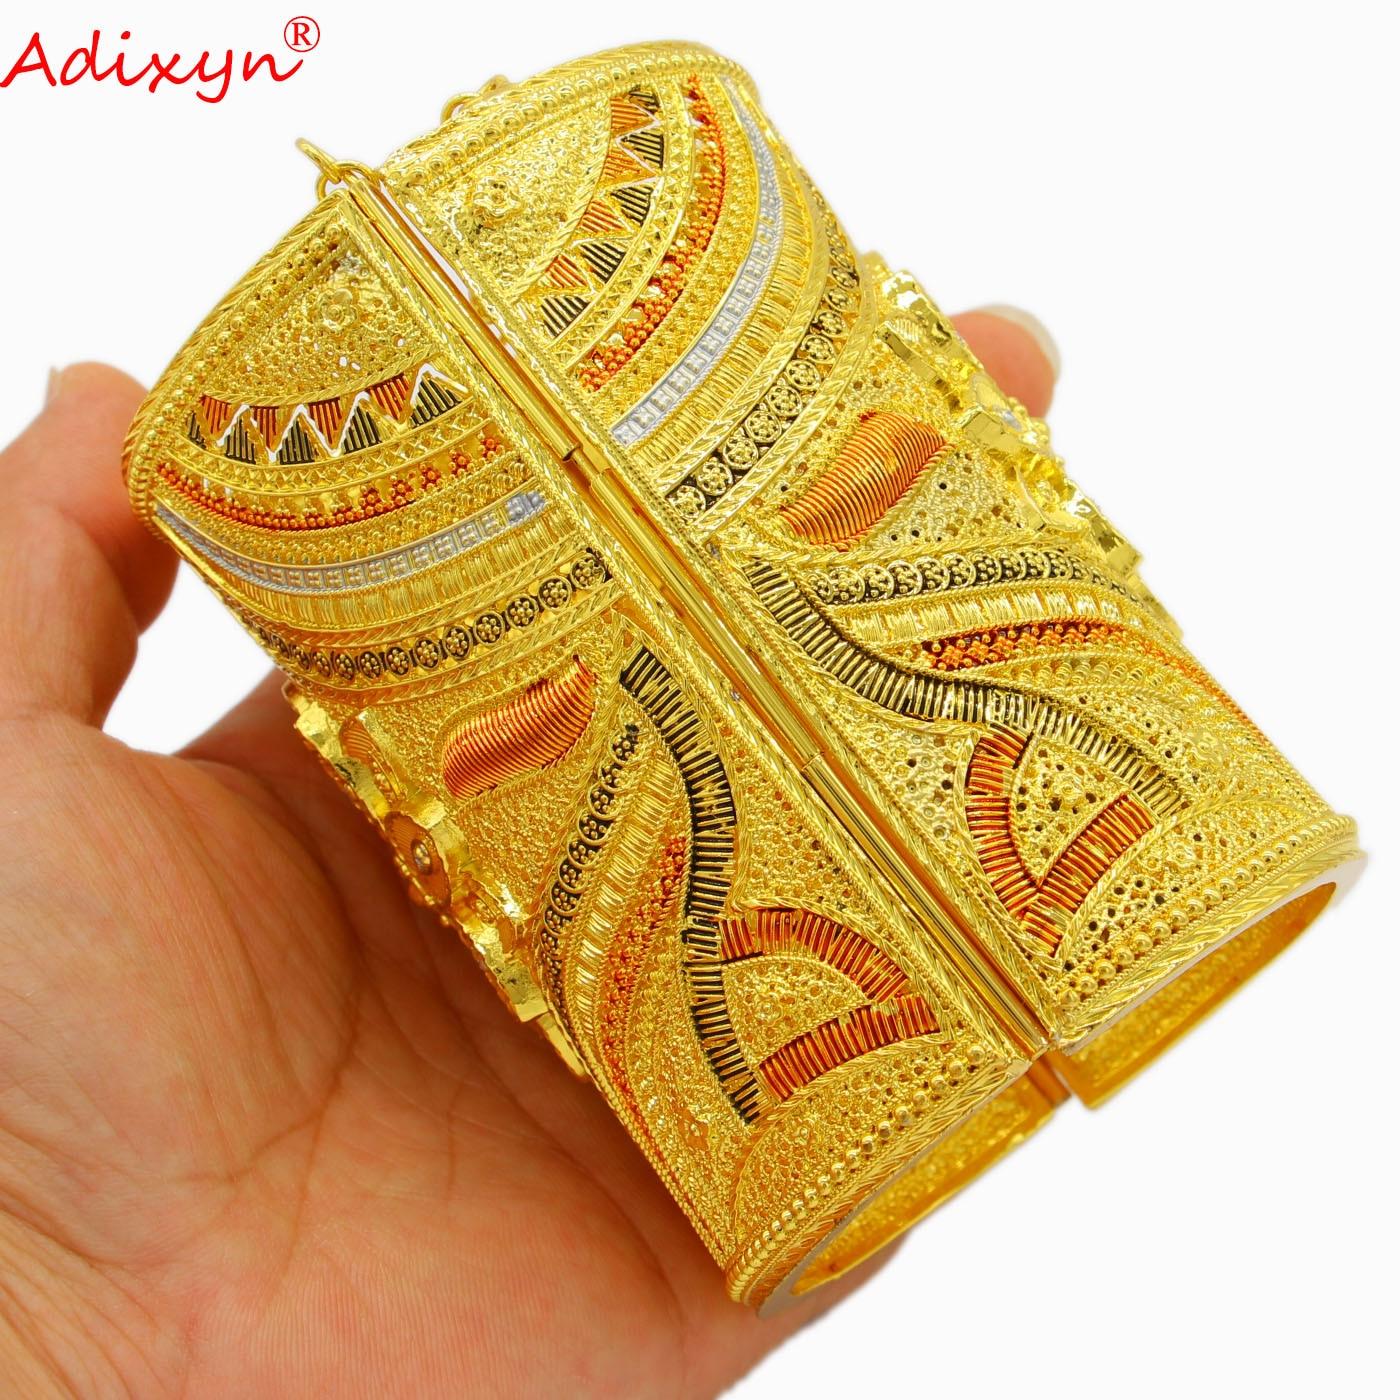 Adixyn عرض دبي أساور هندية لون الذهب كبير الكفة سوار للنساء الزفاف هدايا العربية الأفريقية N04281